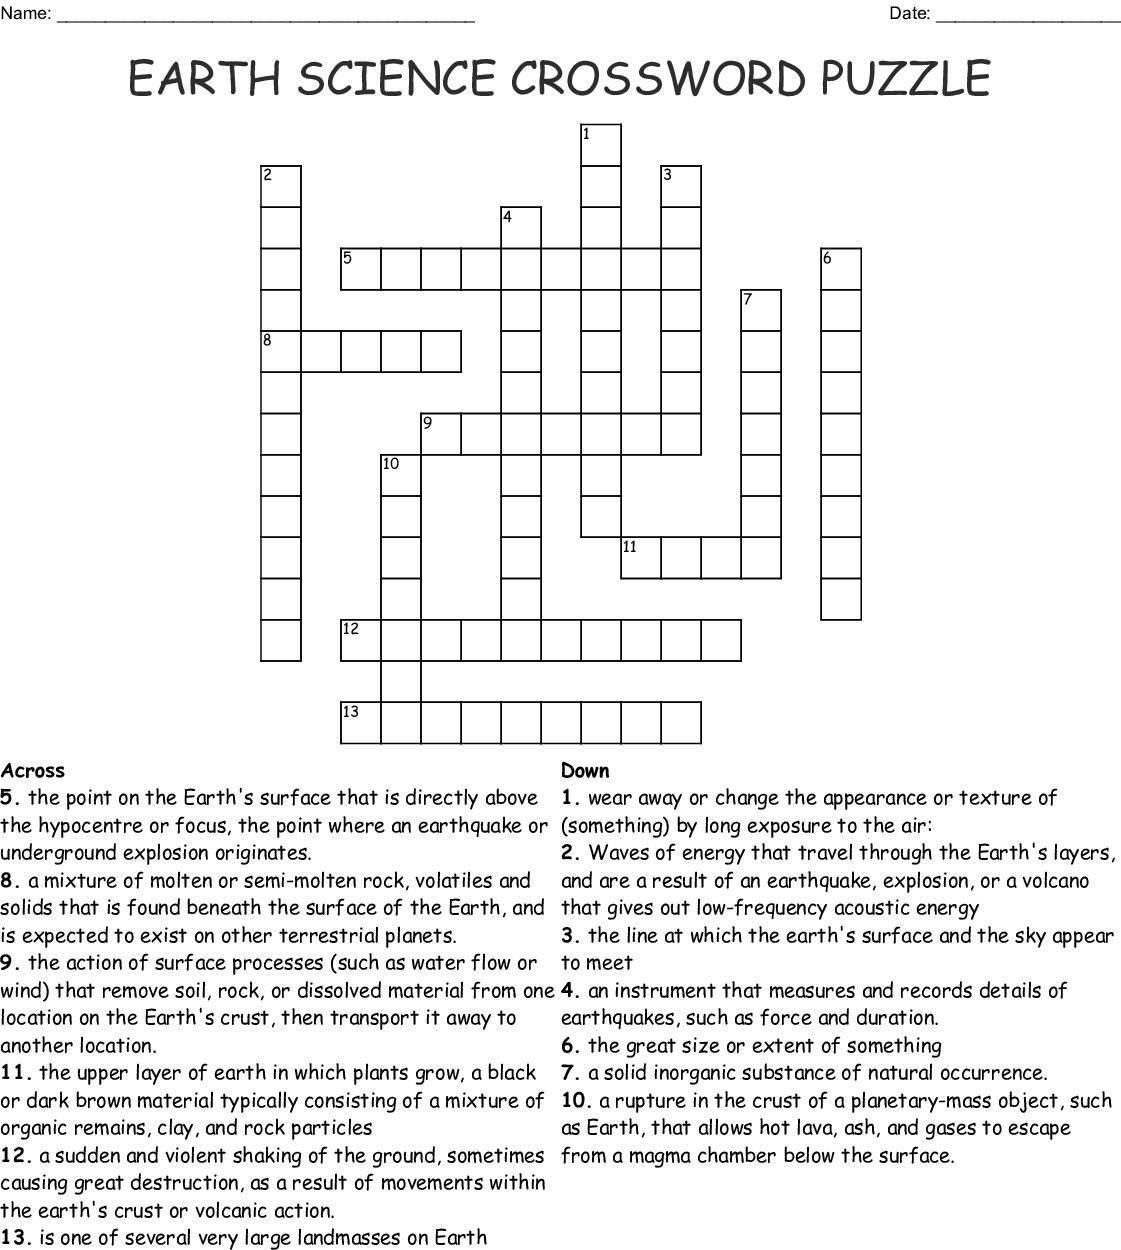 Earth Science Crossword Puzzle Crossword - Wordmint - Science Crossword Puzzles Printable